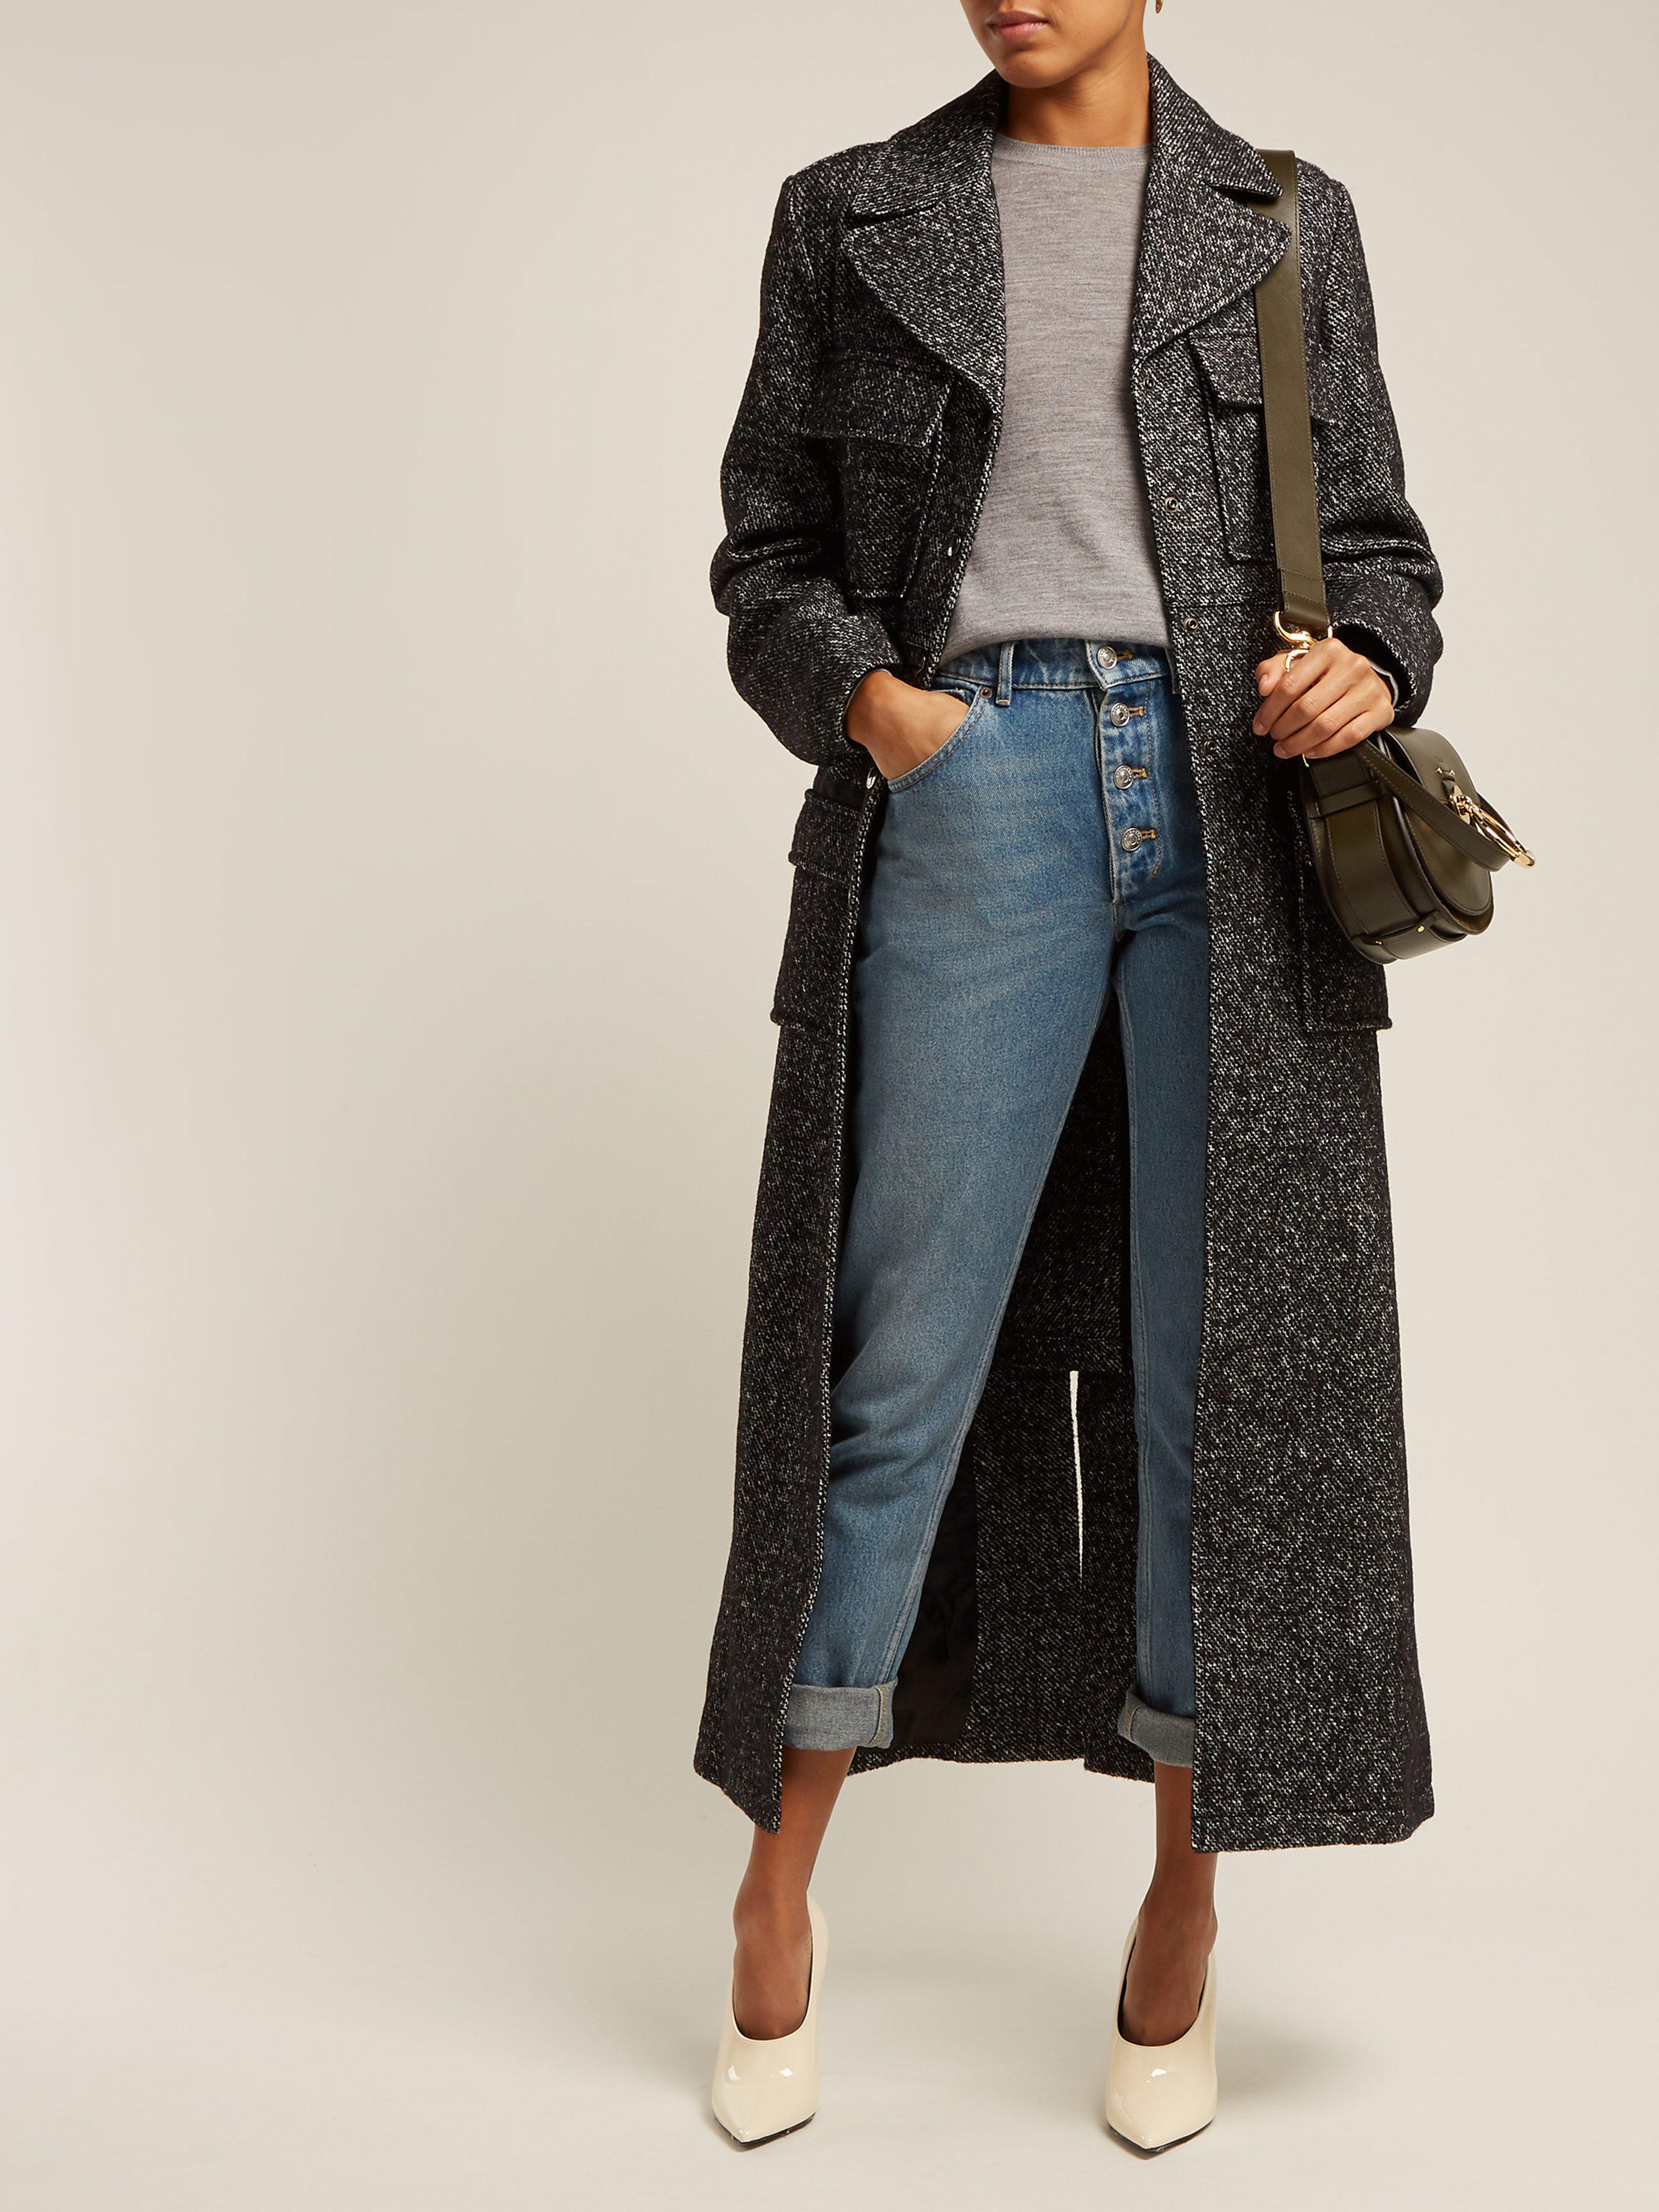 399fafda5328 Burberry Bempton Merino Wool Sweater in Gray - Lyst